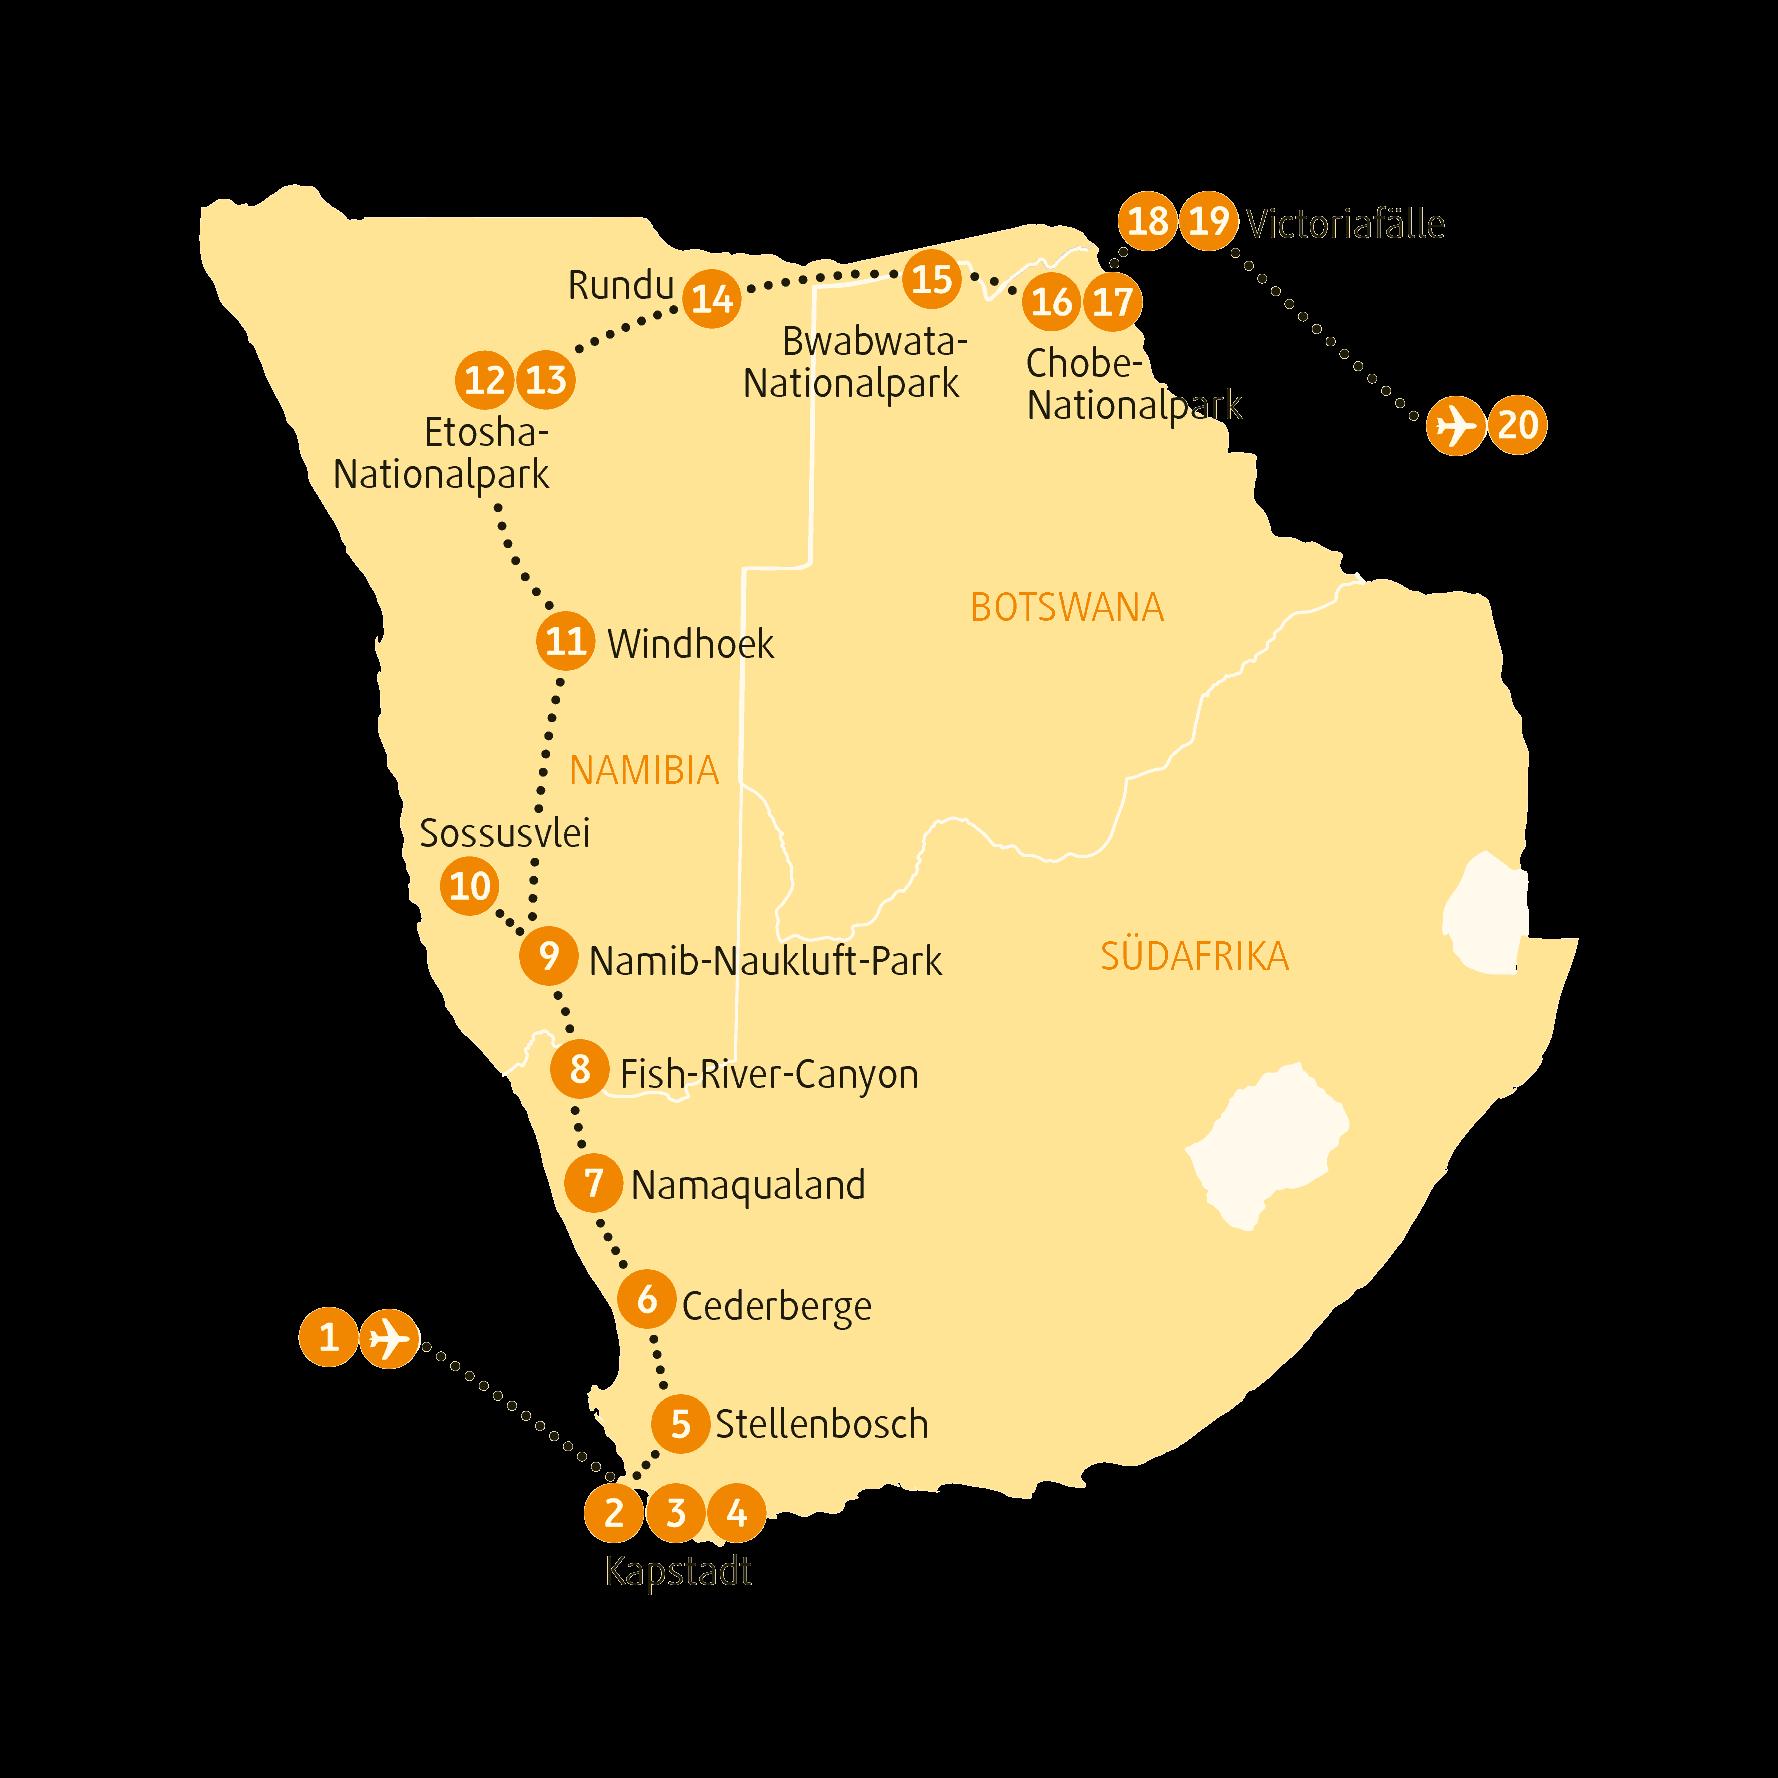 Namaqua